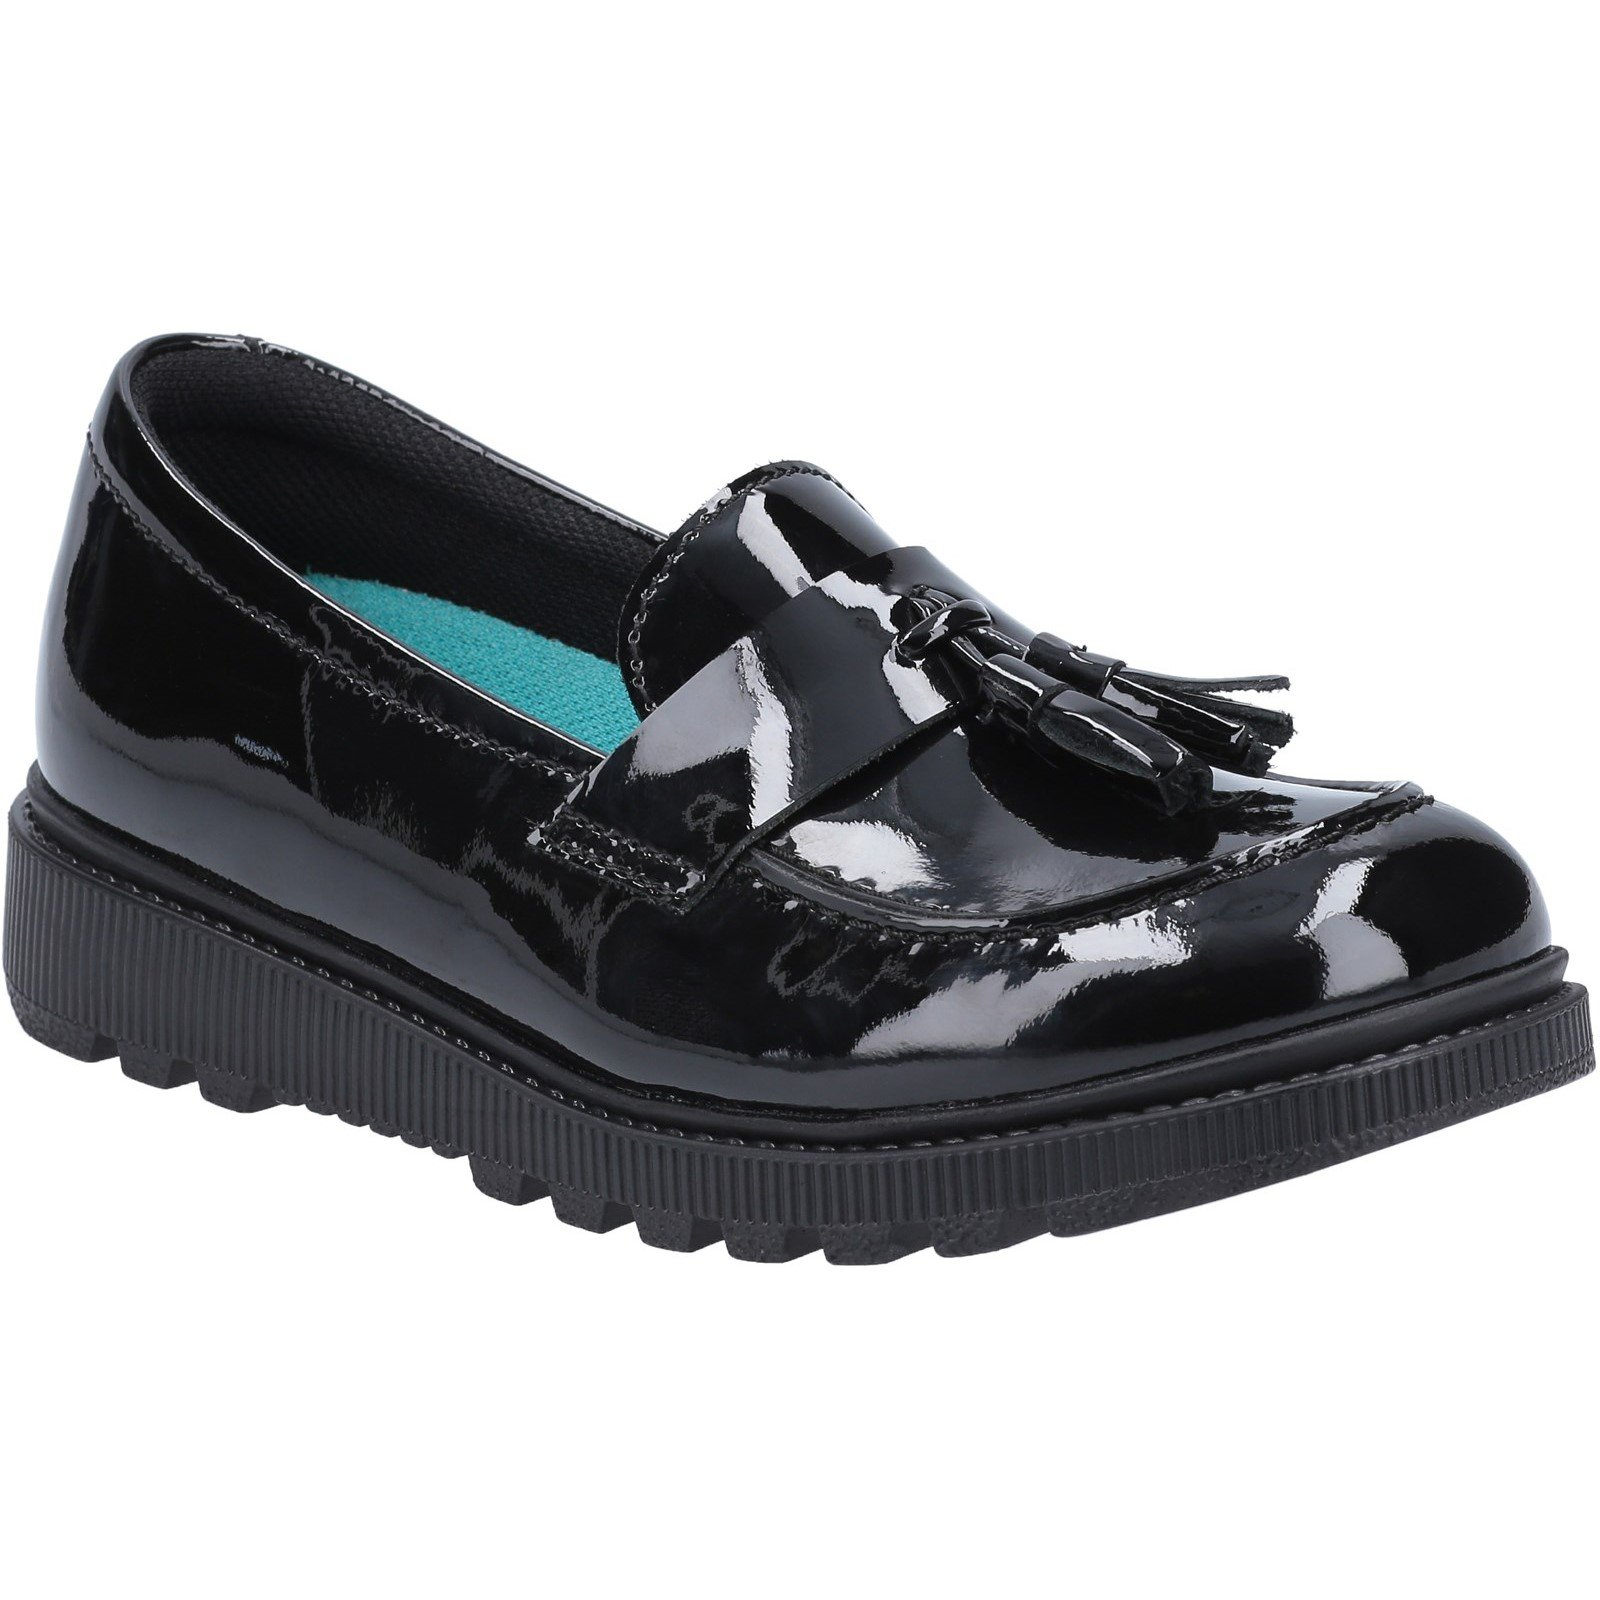 Hush Puppies Kid's Karen Junior School Shoe Patent Black 30827 - Patent Black 12